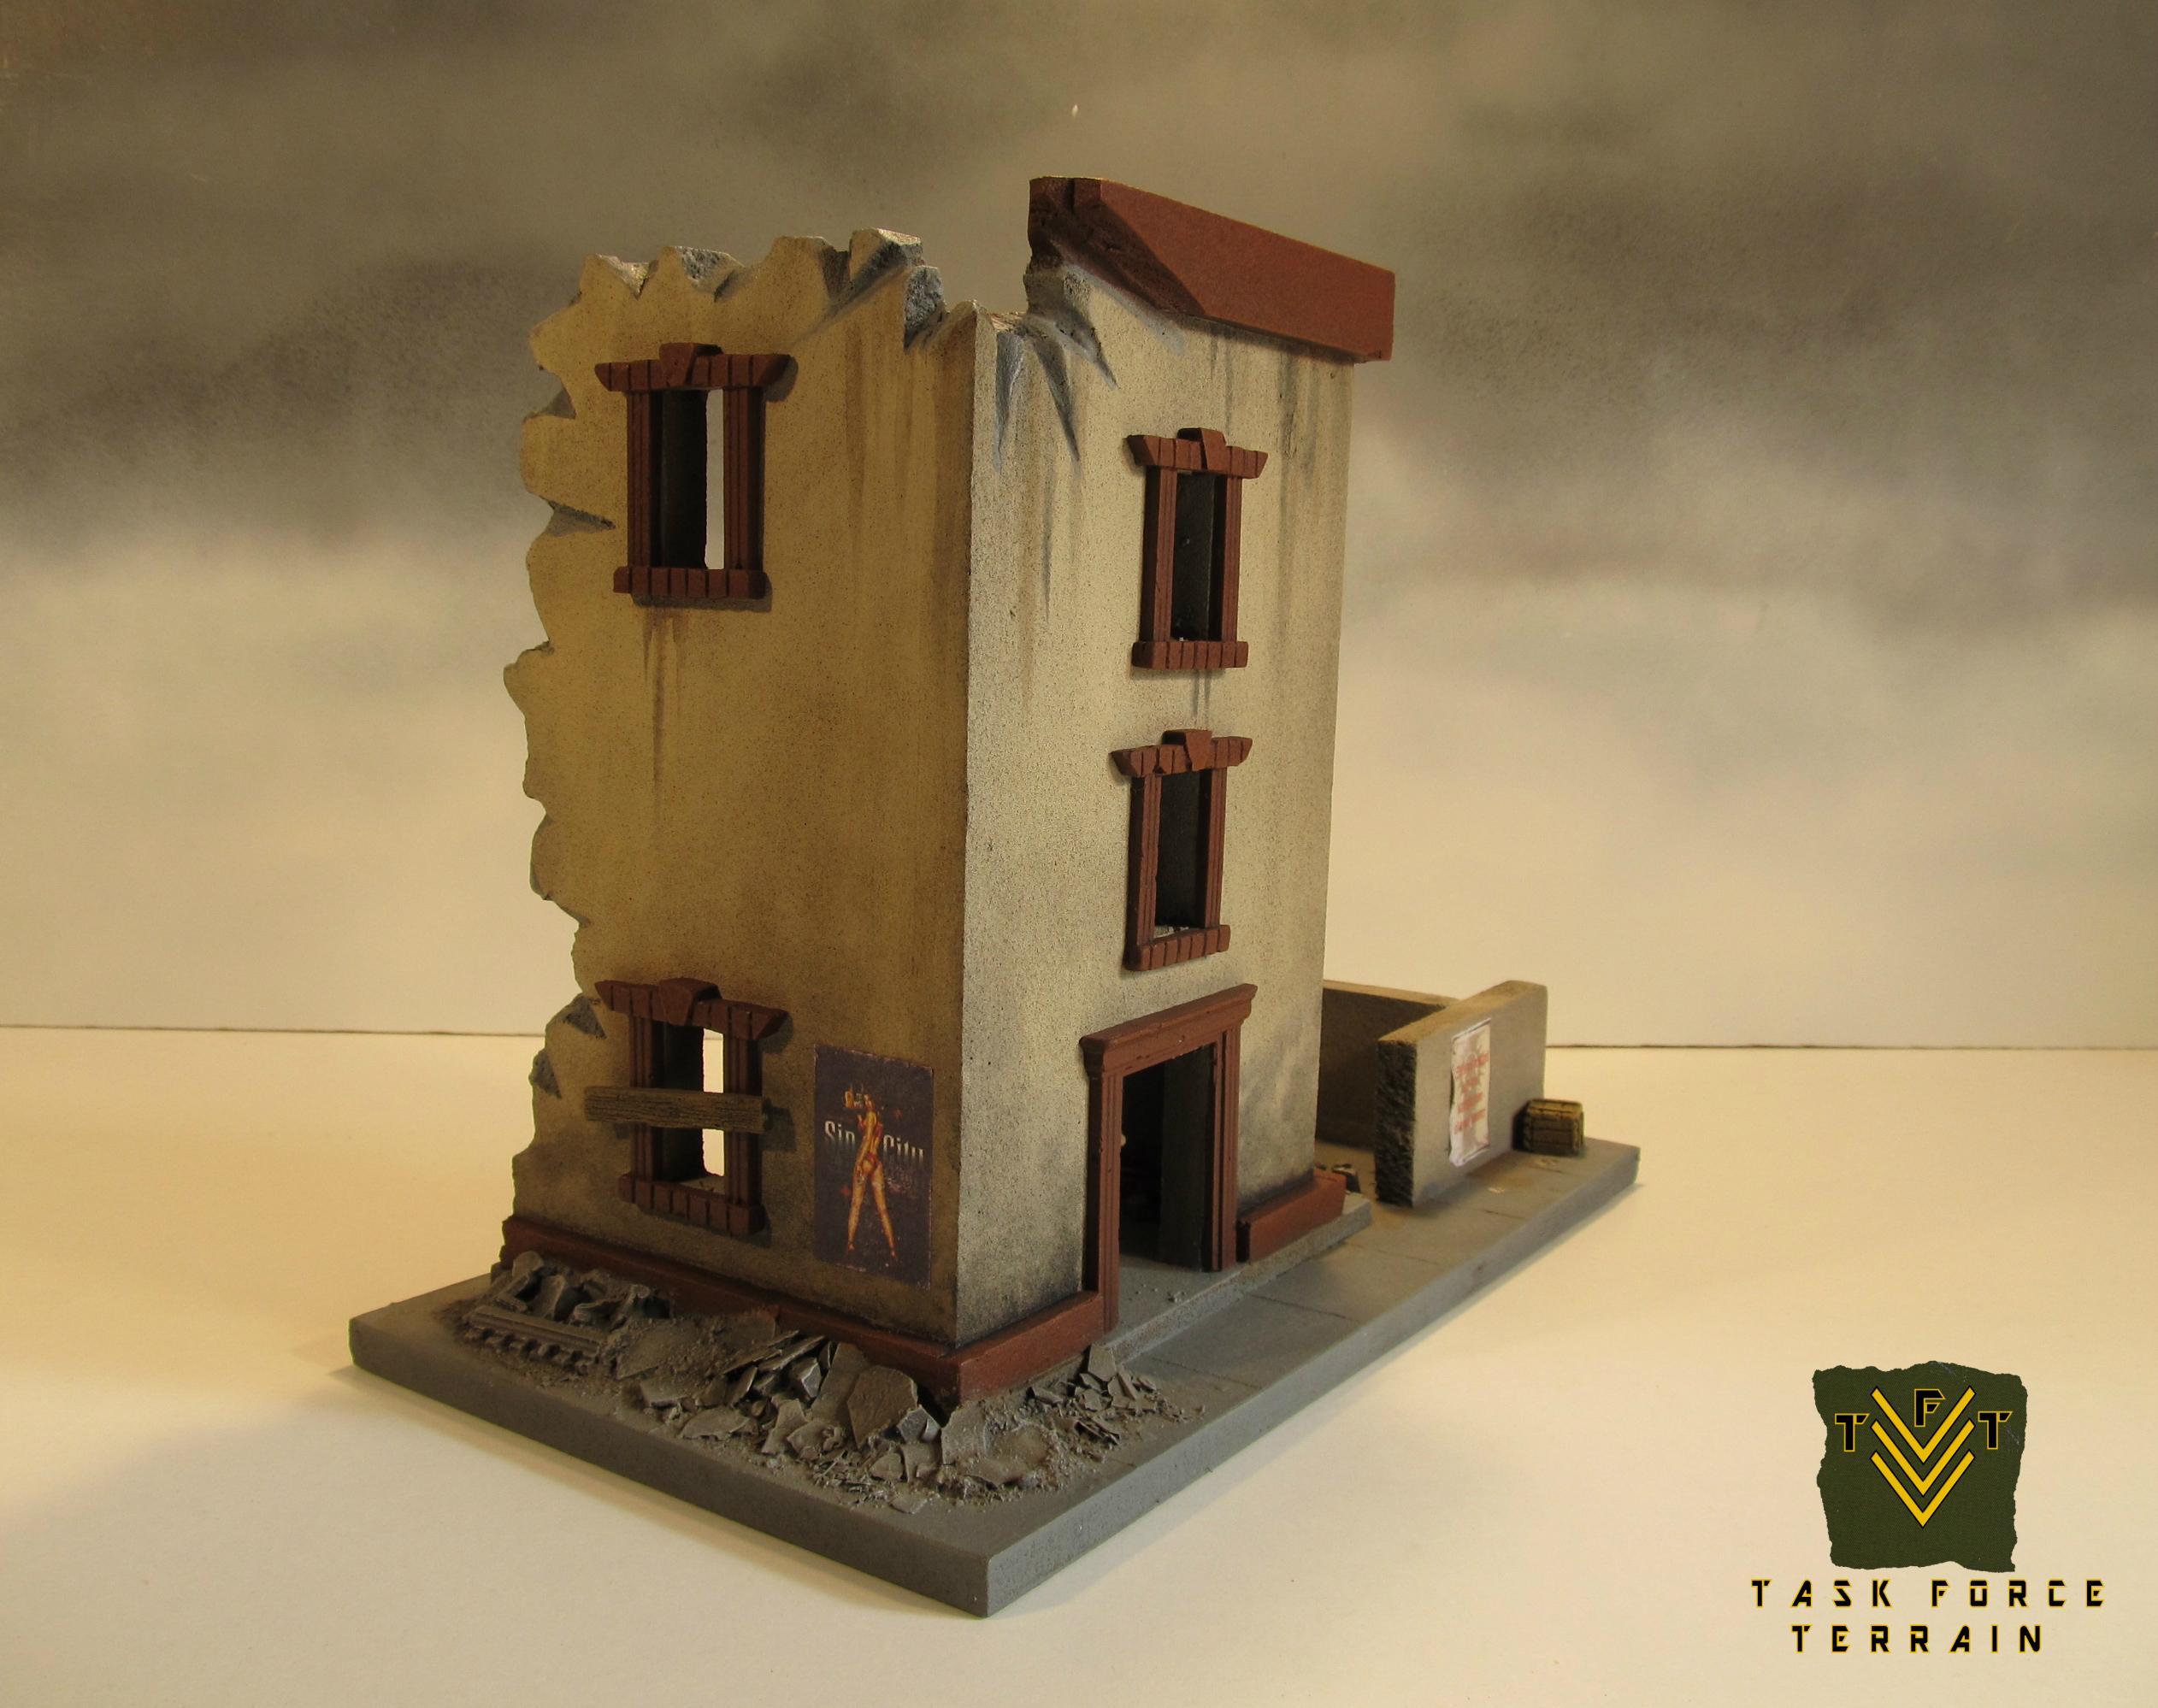 40k Buildings, 40k Terrain, Terrain, Warhamer40k, Warhammer 40,000, Warhammer Fantasy